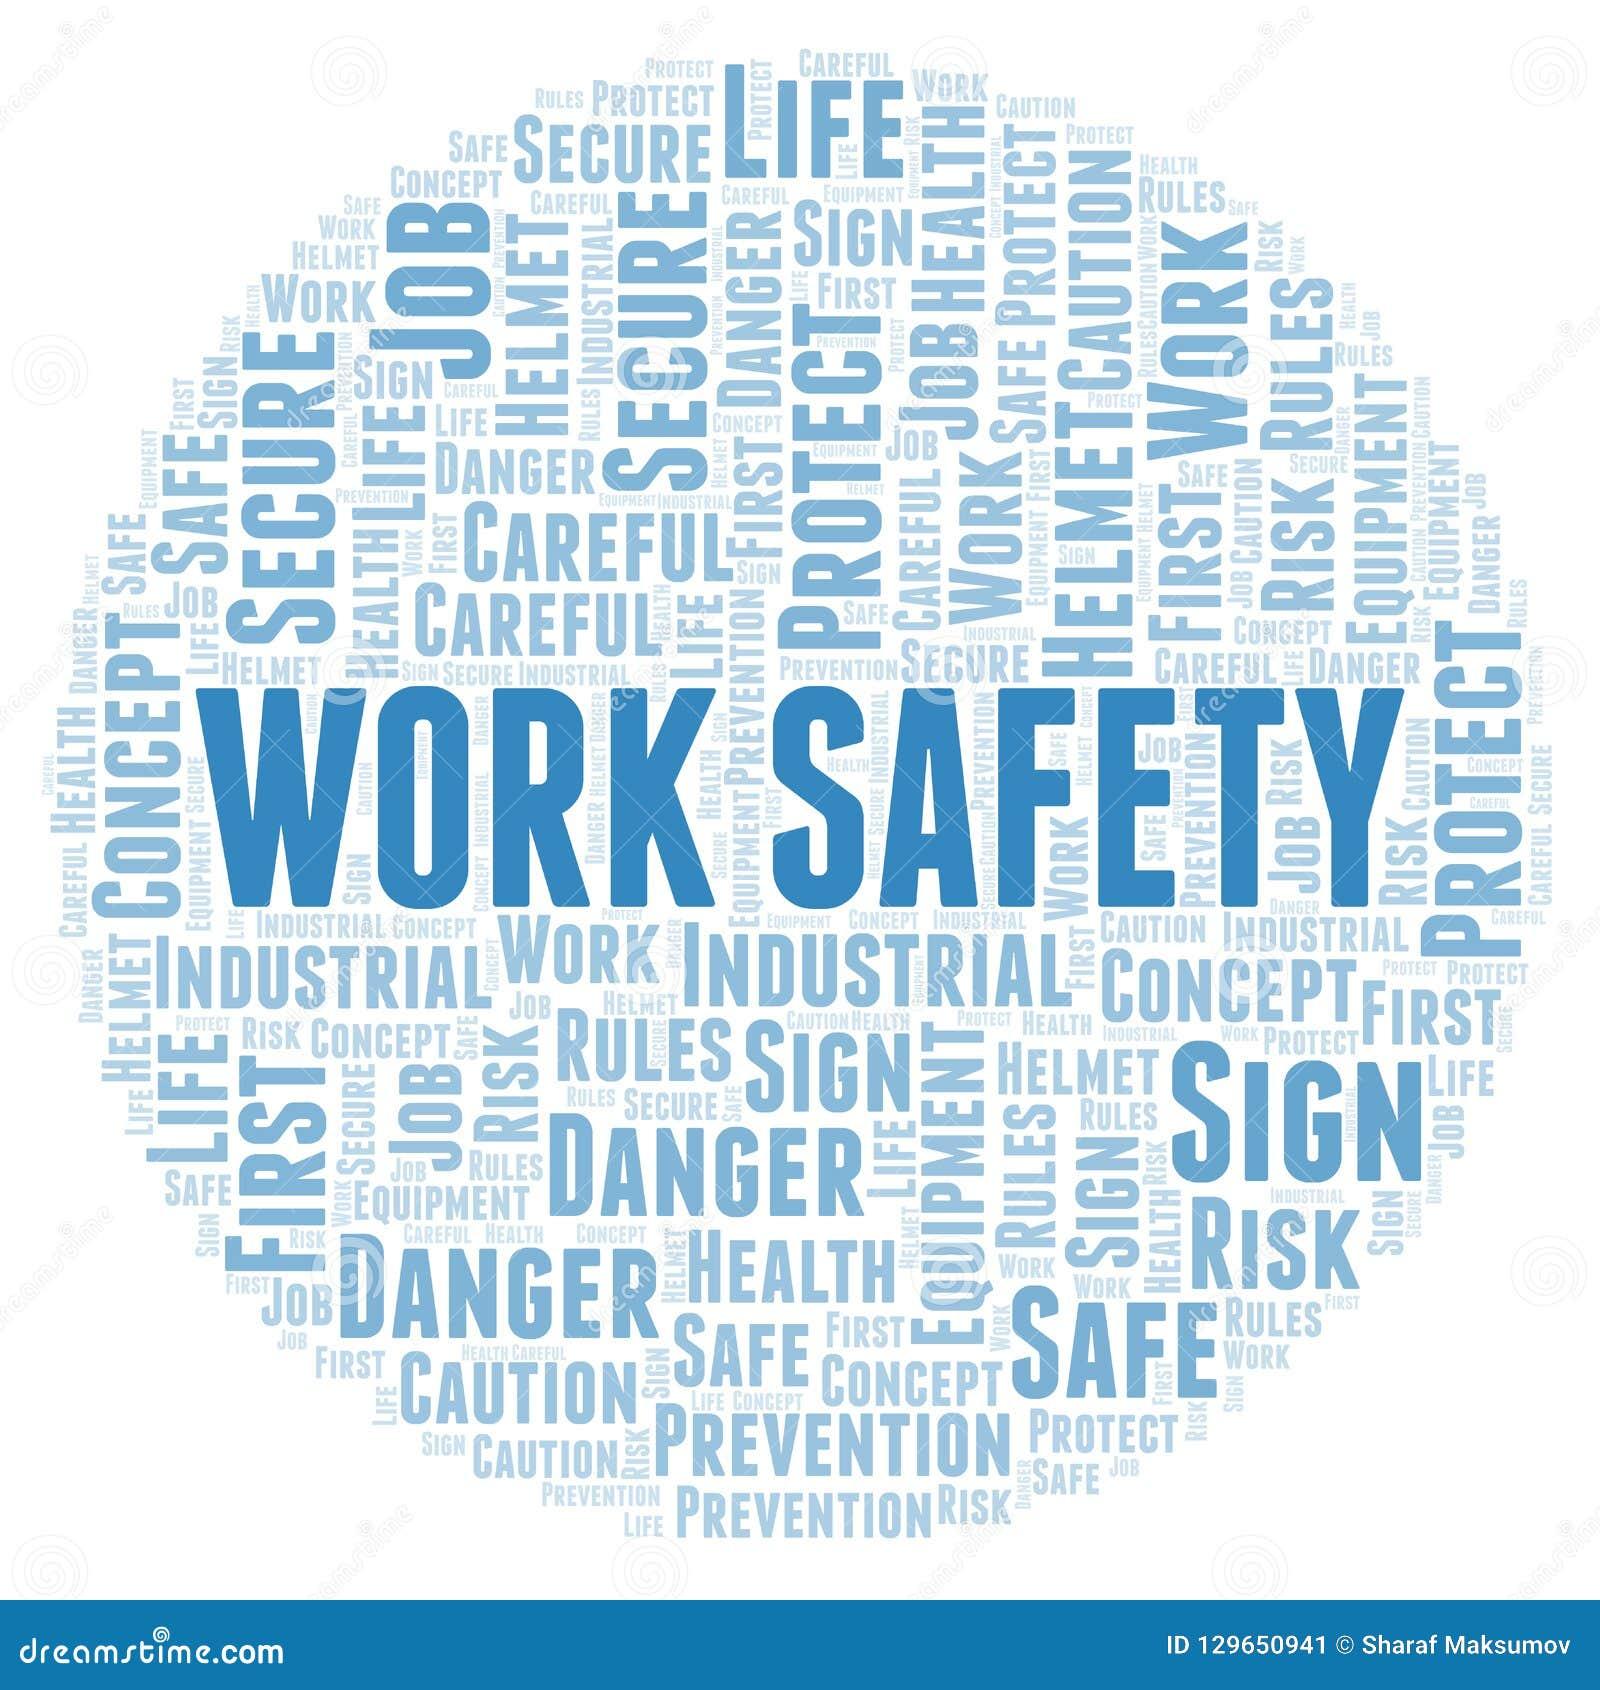 Work Safety word cloud.